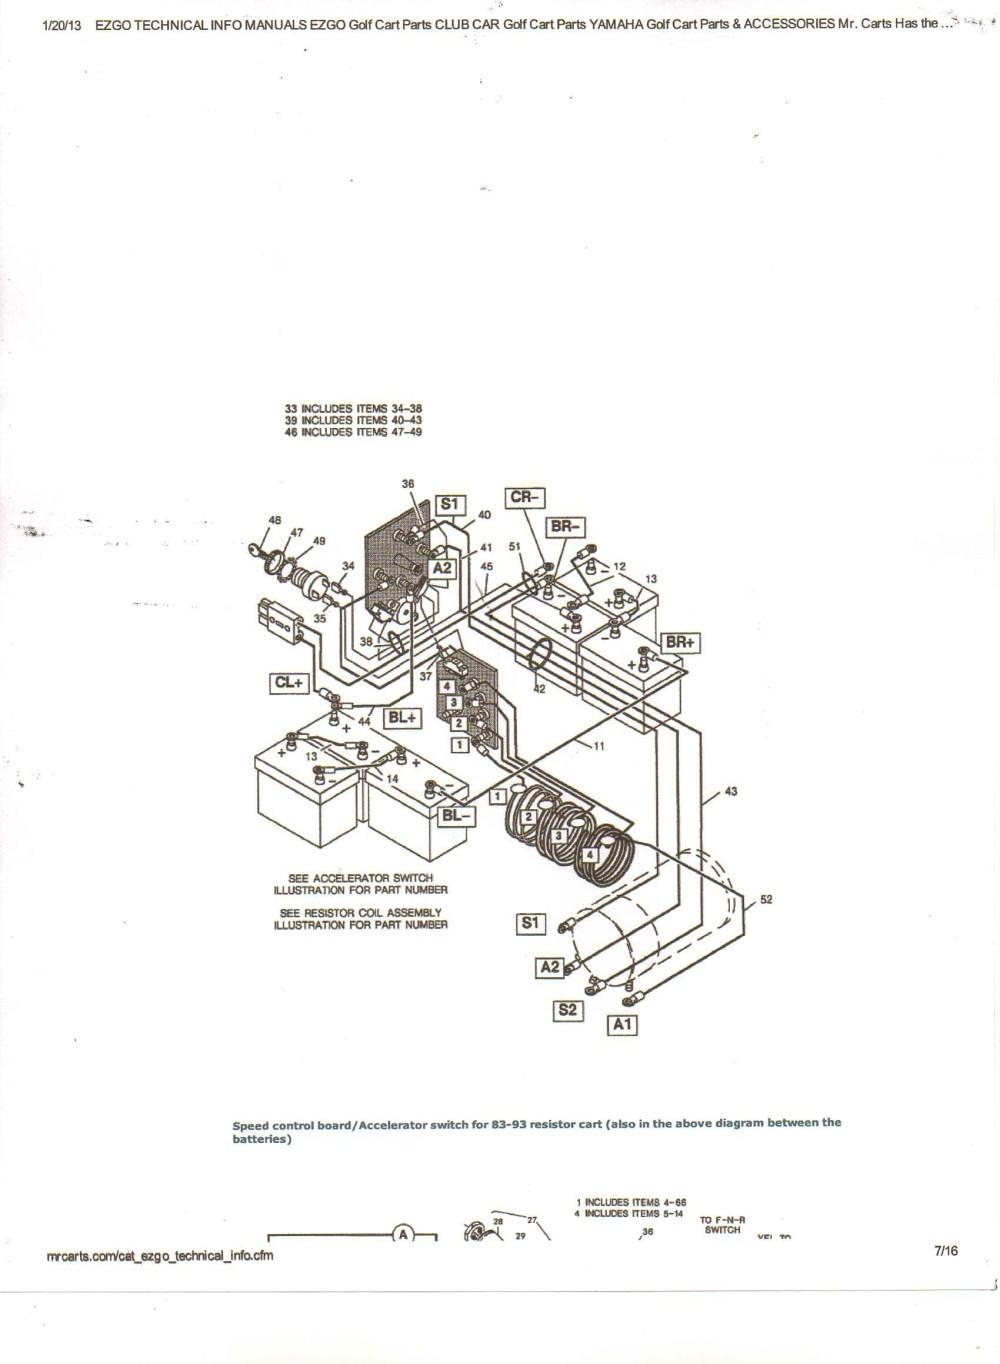 medium resolution of ezgo golf cart wiring diagram tryit me 3 hastalavista ezgo golf cart wiring diagram